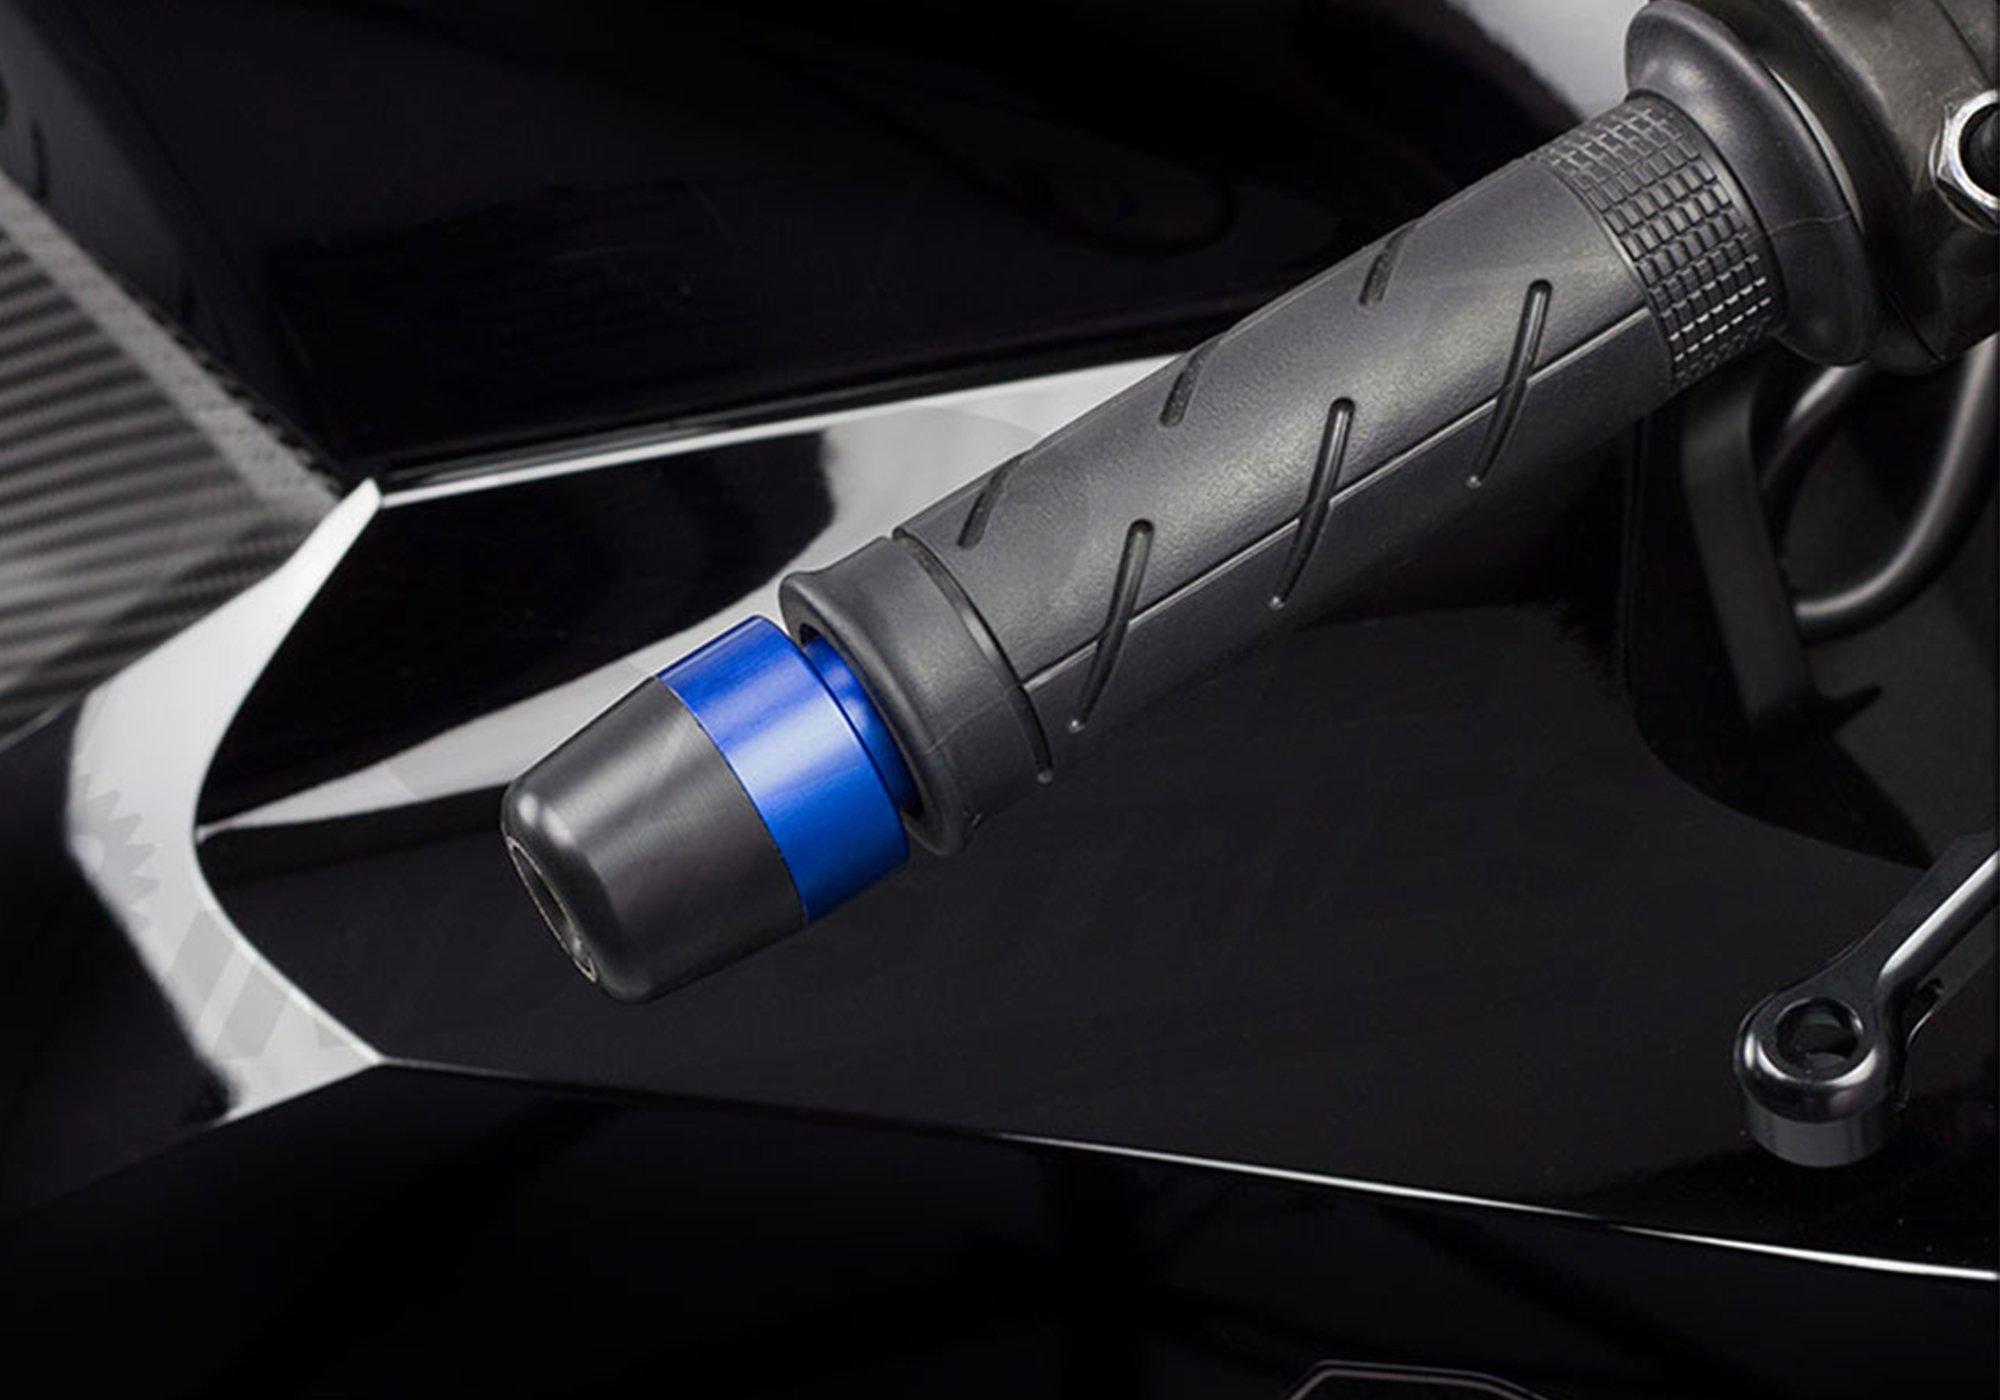 Bar Ends for Honda CBR600RR CBR1000RR F4 F4i (Blue) by TST Industries (Image #2)